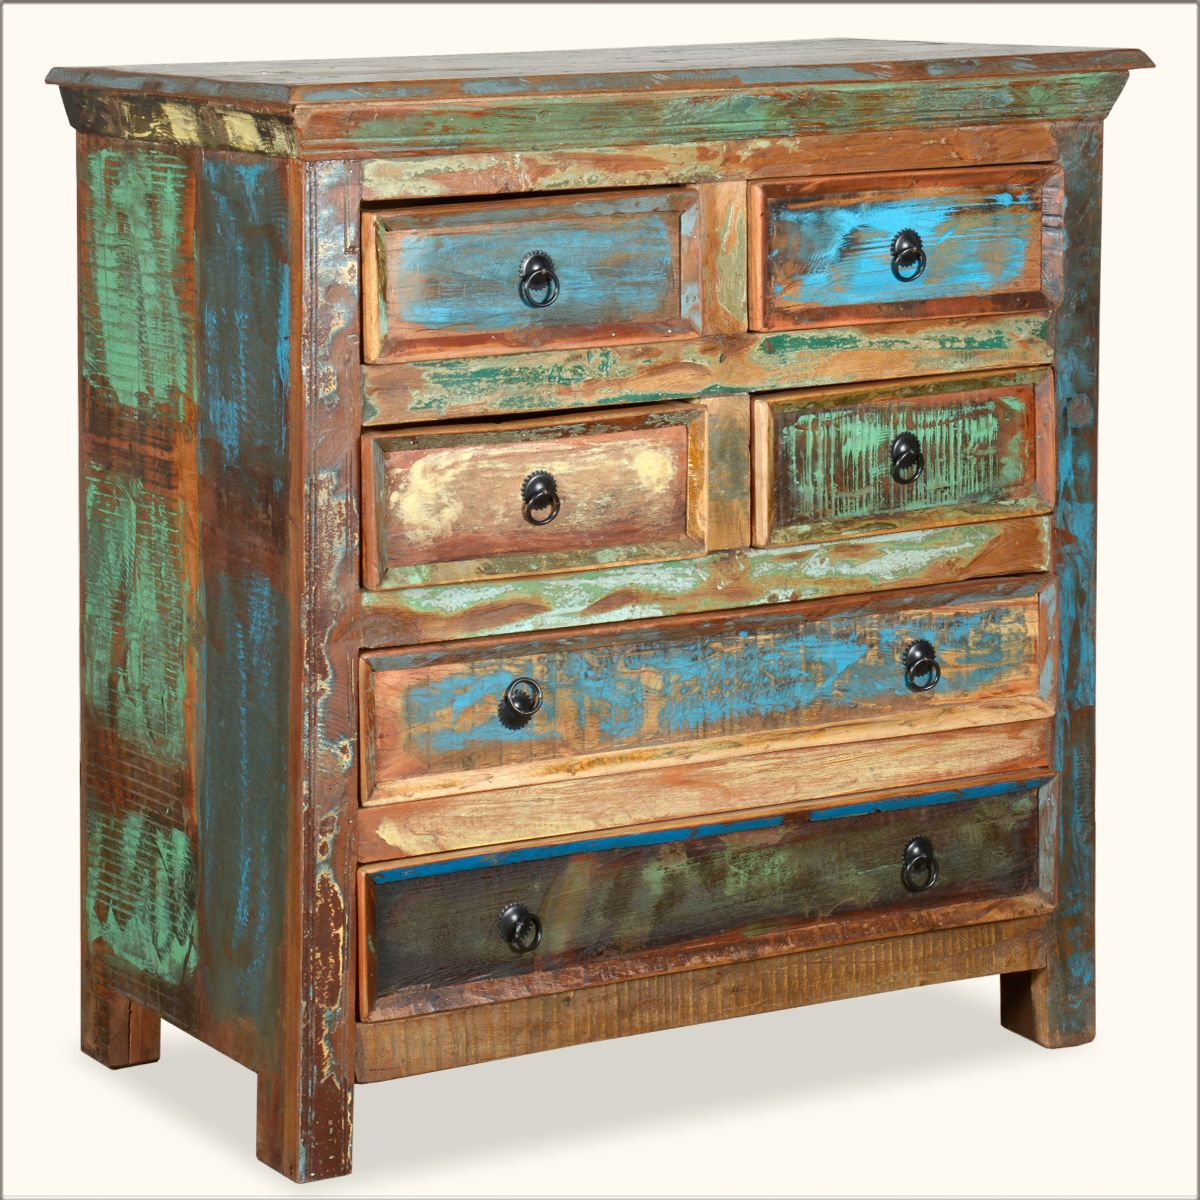 Appalachian rustic painted old wood drawer bedroom dresser